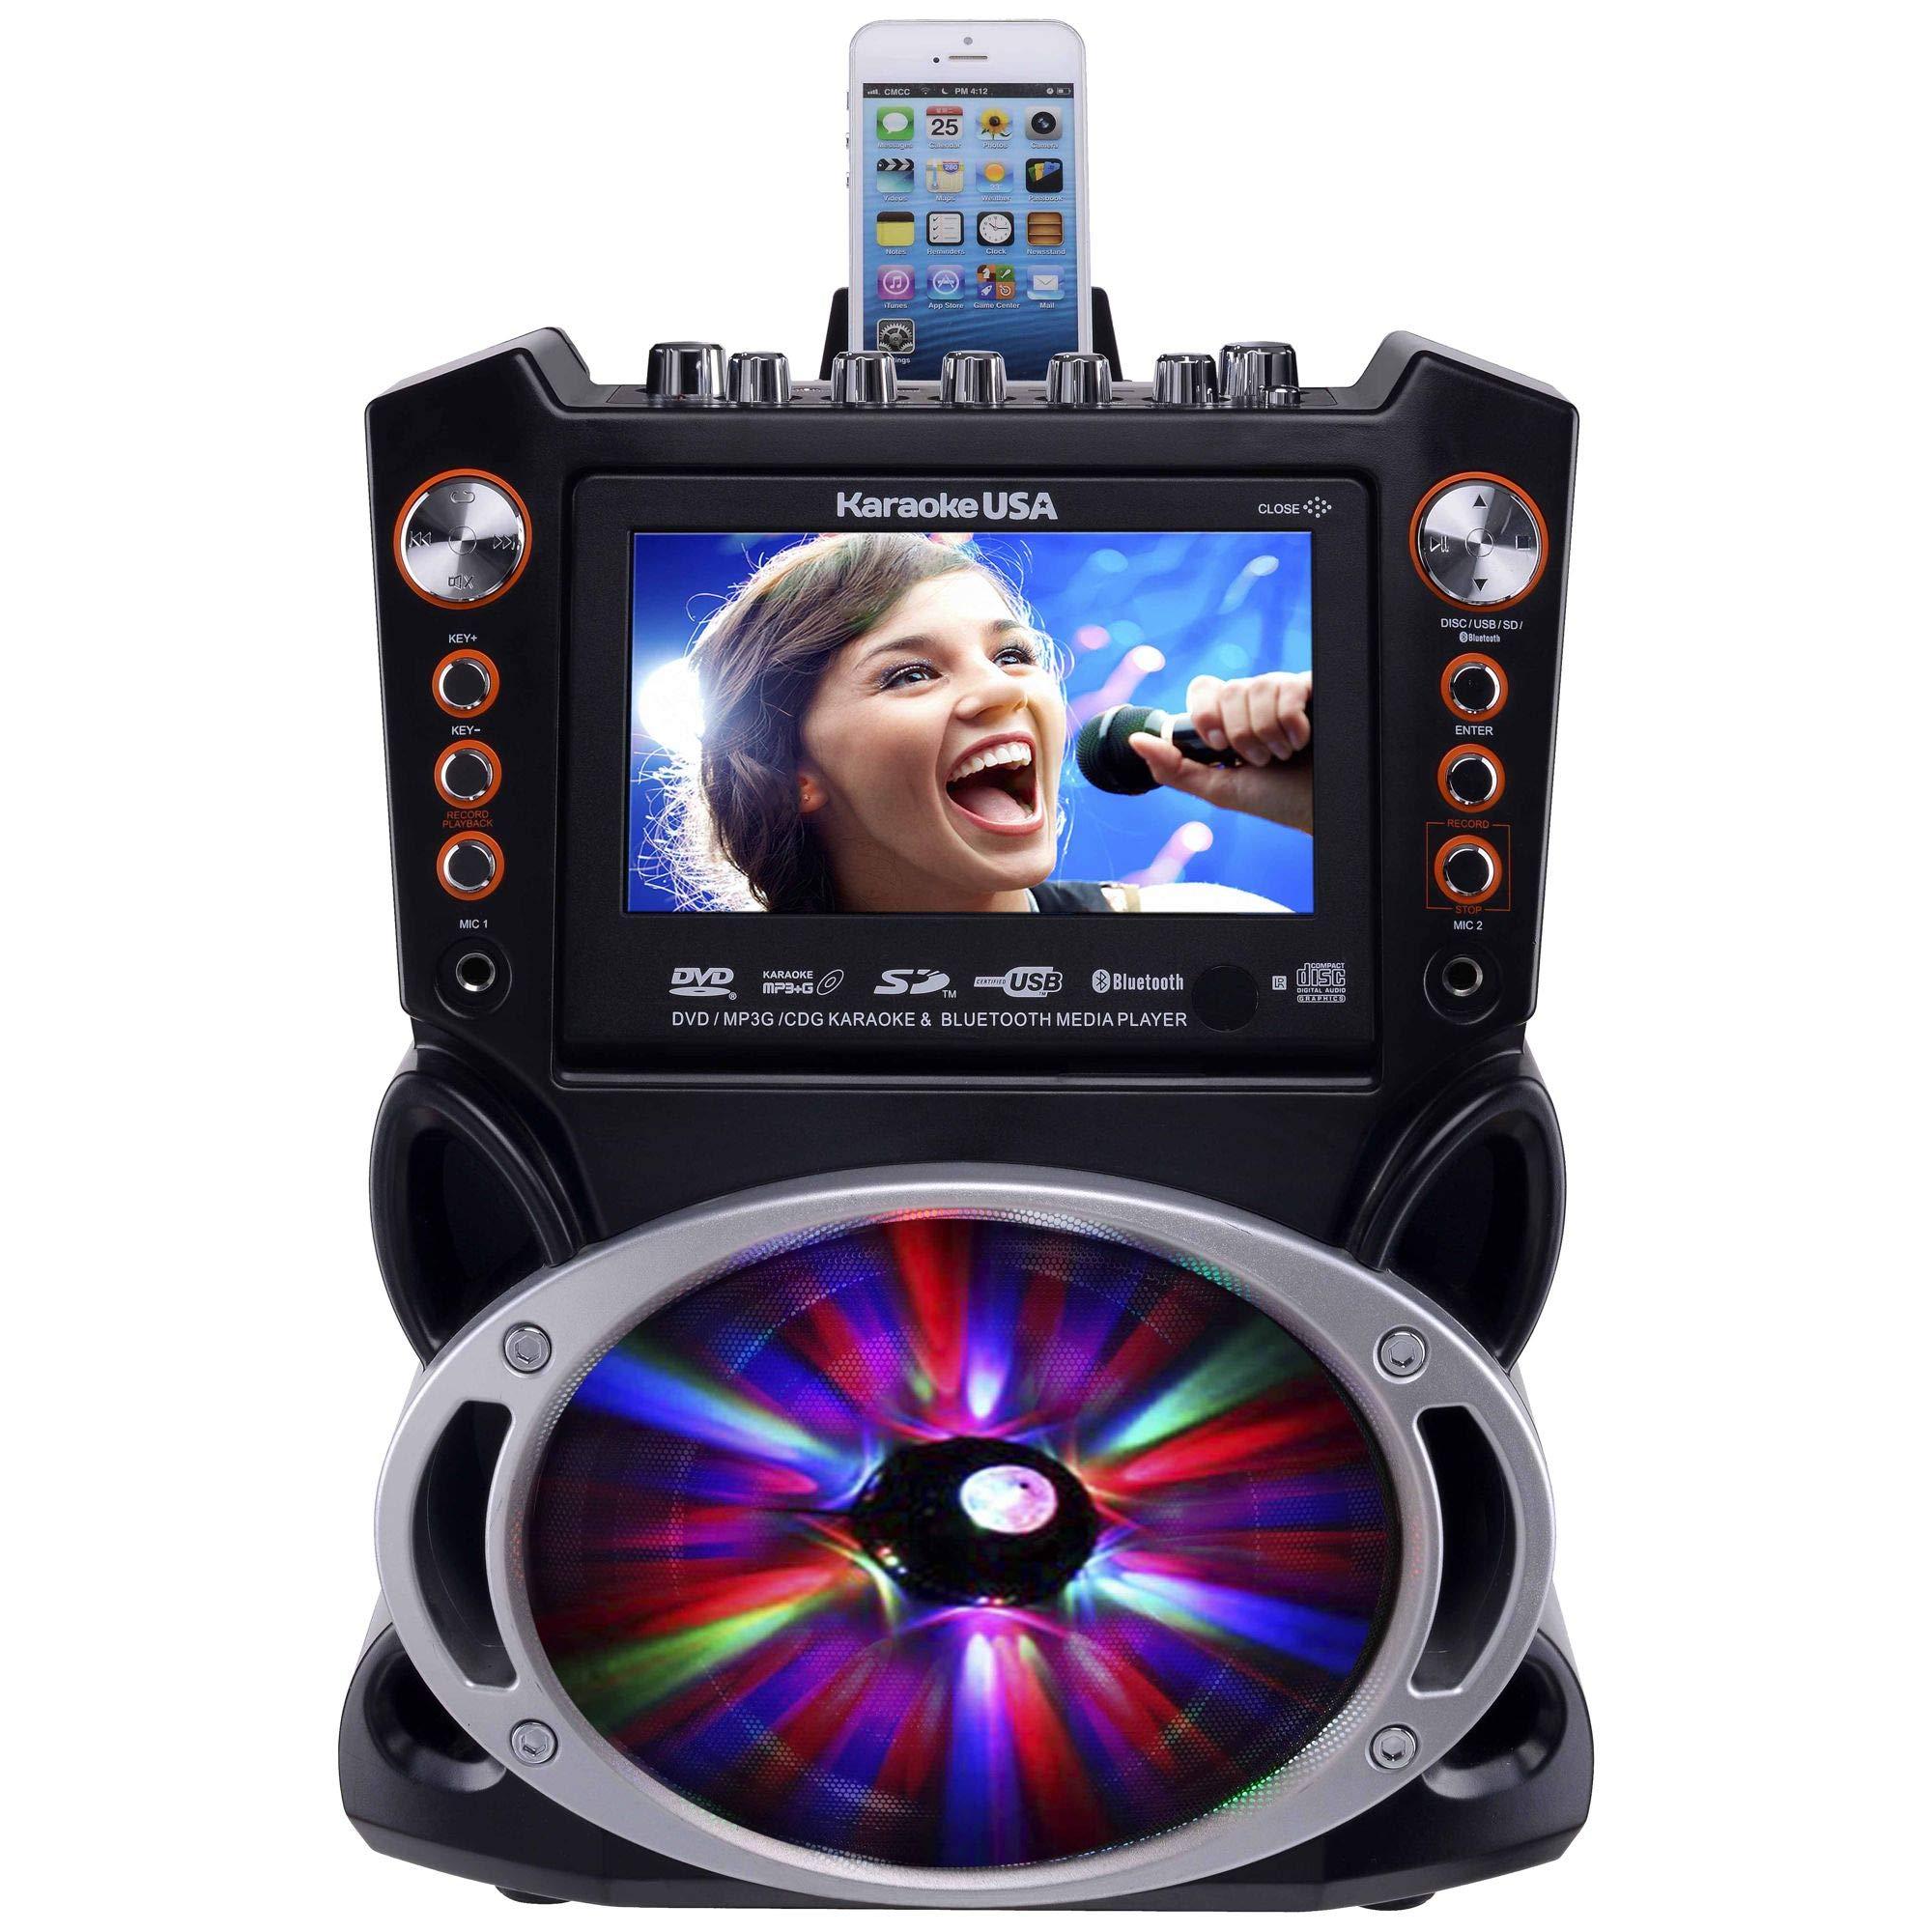 Karaoke USA GF846 DVD/CDG/MP3G Karaoke Machine with 7'' TFT Color Screen, Record, Bluetooth and LED Sync Lights by Karaoke USA (Image #3)